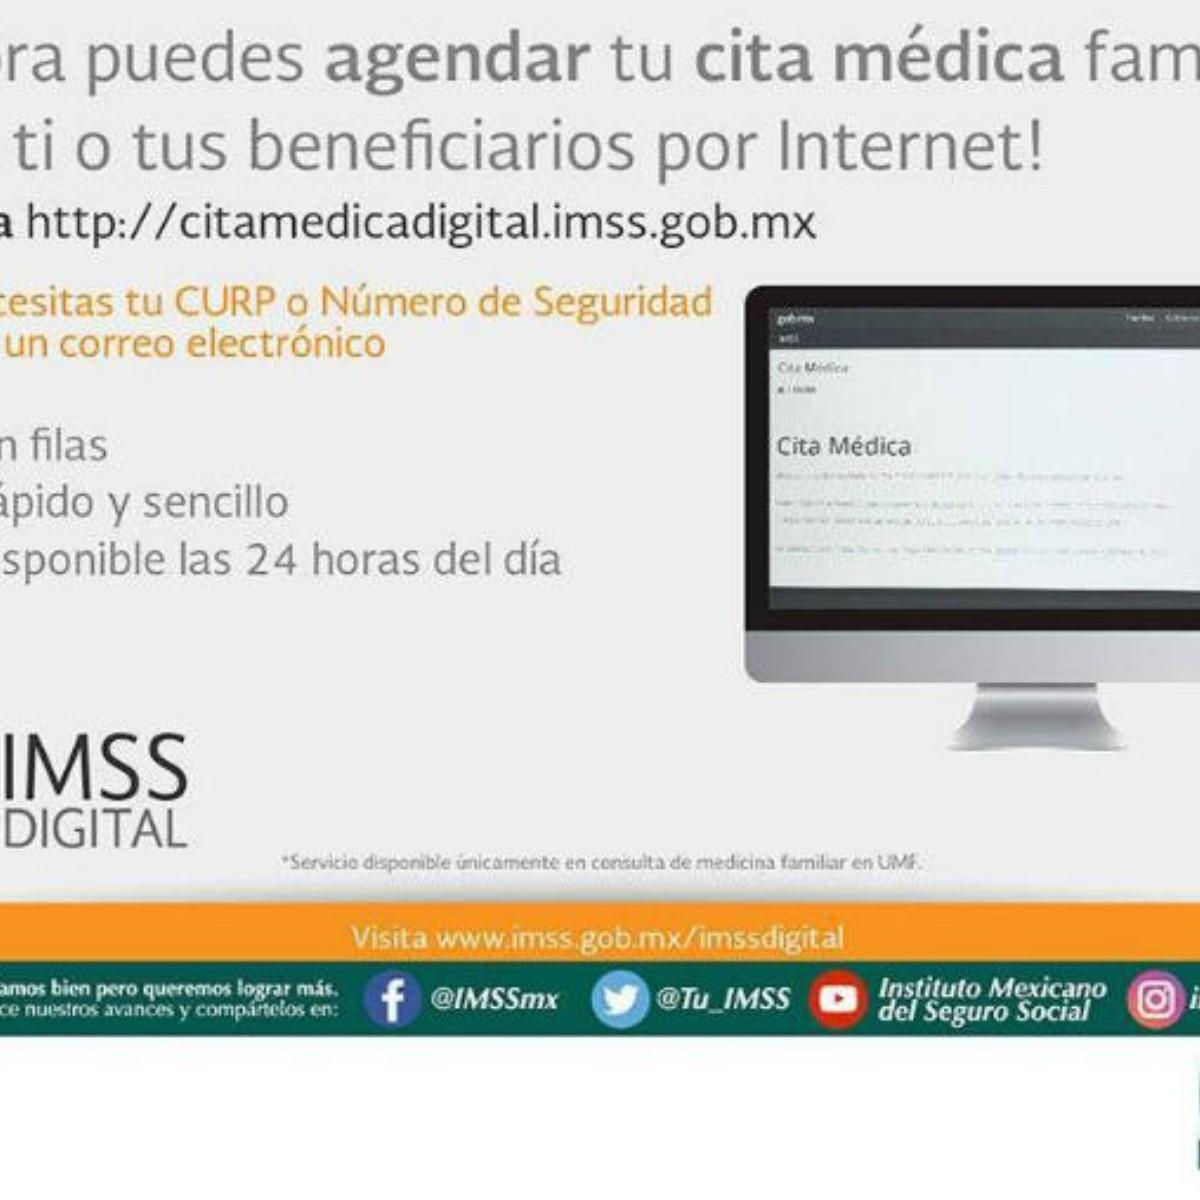 Agenda tu Cita Médica Digital